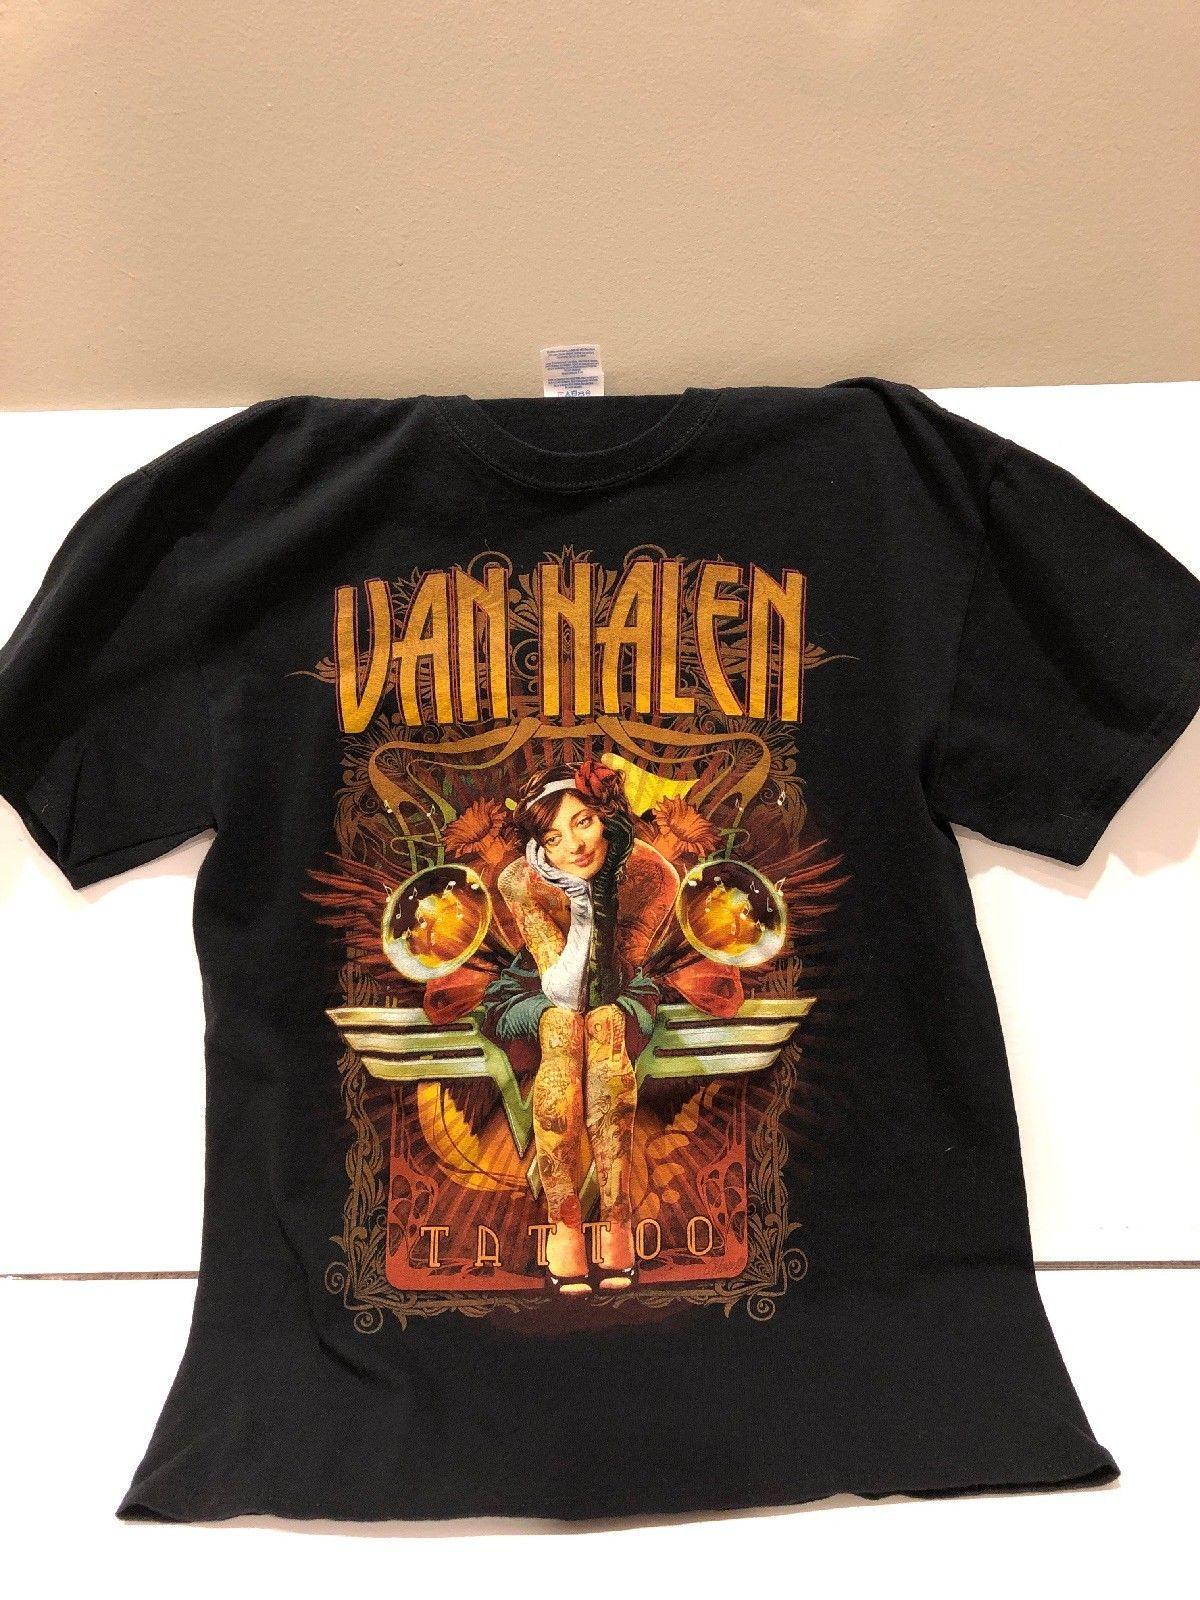 36ceef456 Van Halen Tattoo 2012 Tour T Shirt Black Rock Band Music Concert Eddie Sz M  Rude Tshirts Offensive Tee Shirts From Designtshirts201806, $13.91|  DHgate.Com